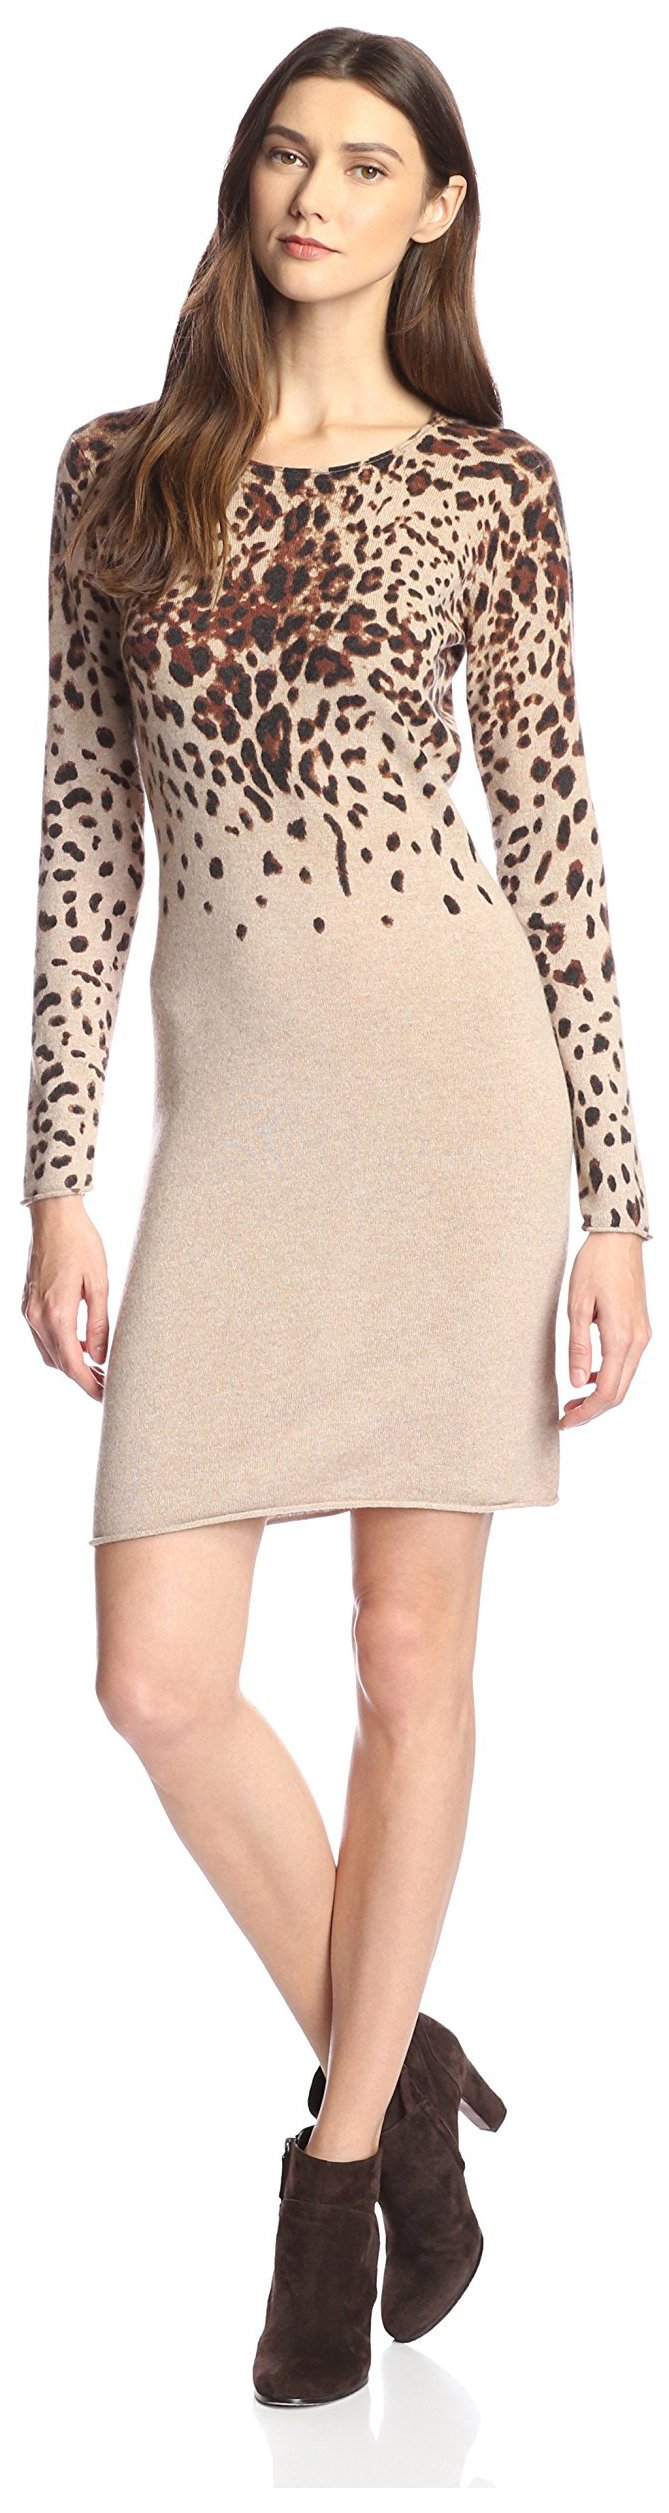 James & Erin Women's Cashmere Leopard Print Sweater Dress, Natural Multi, S